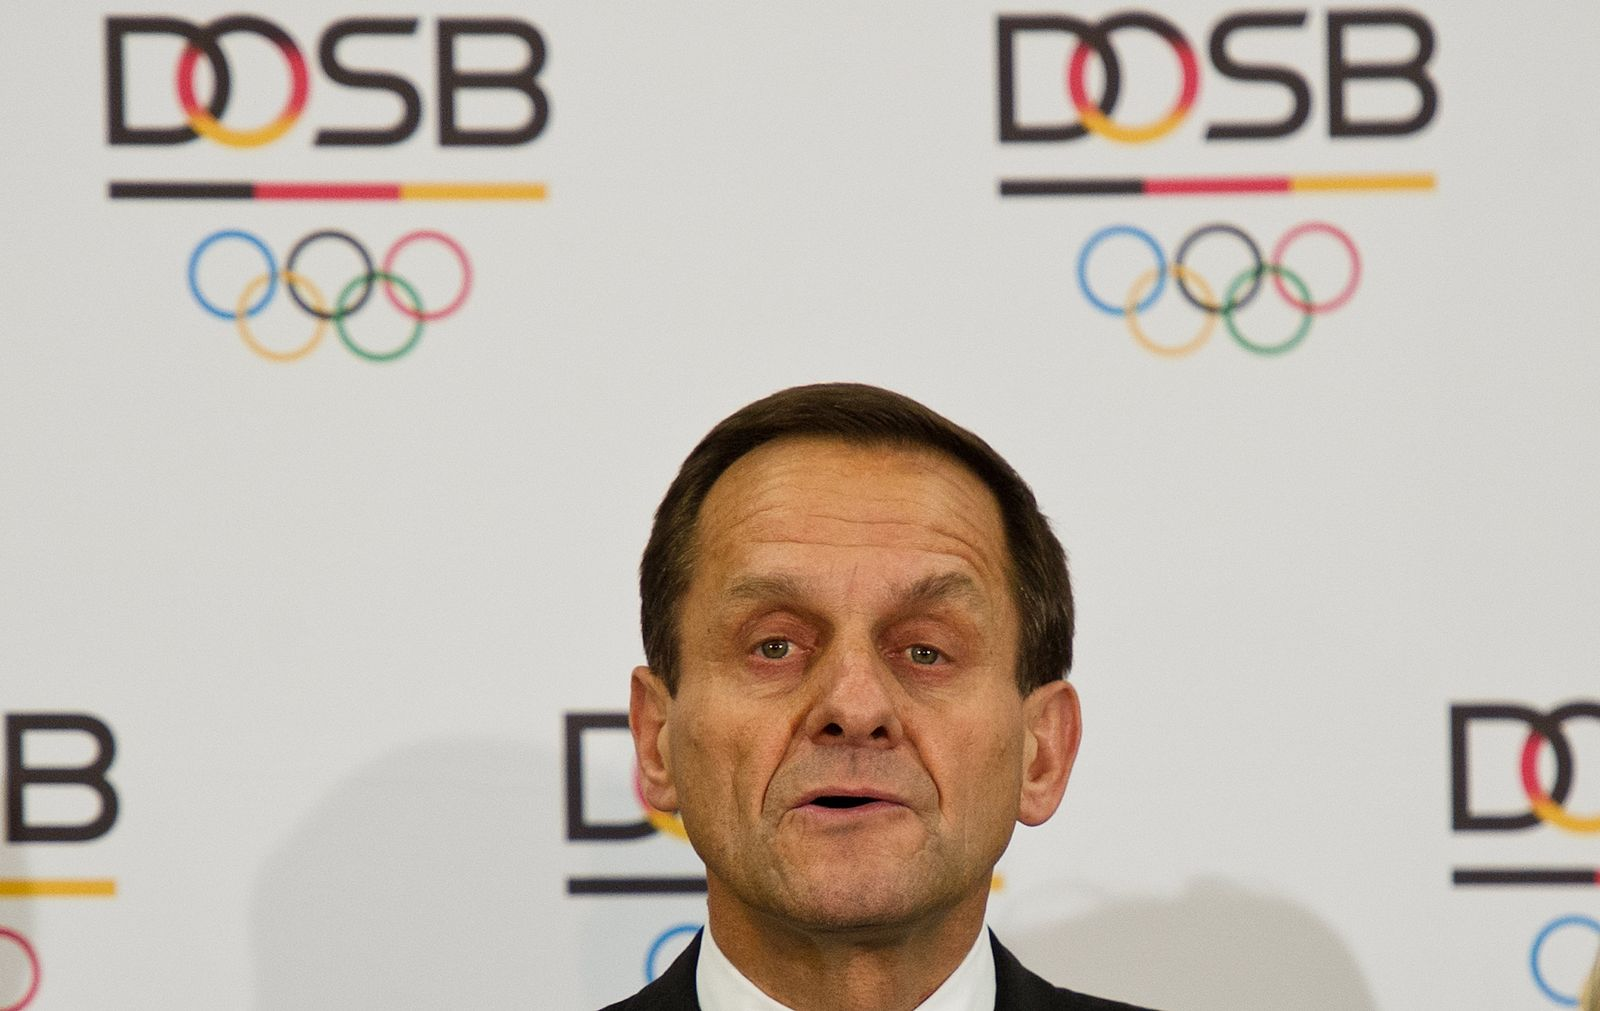 DOSB entscheidet über deutsche Olympia 2024-Bewerberstadt